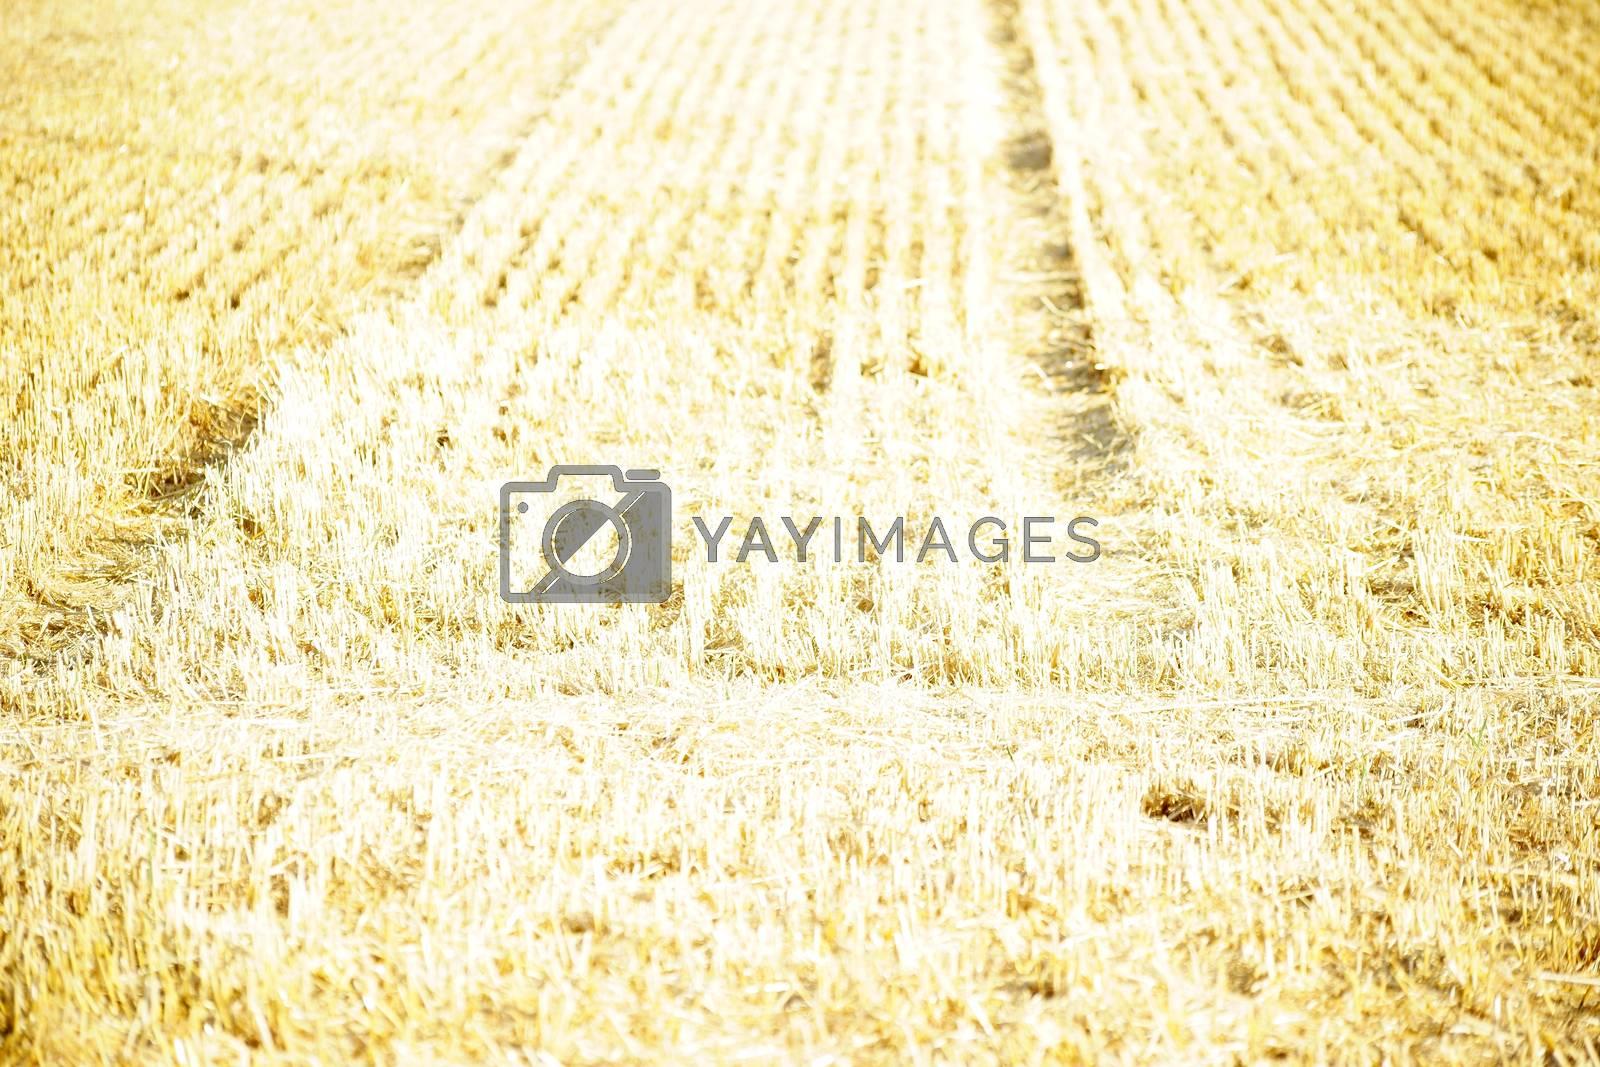 A strong through the sunlight shining mowed cornfield.